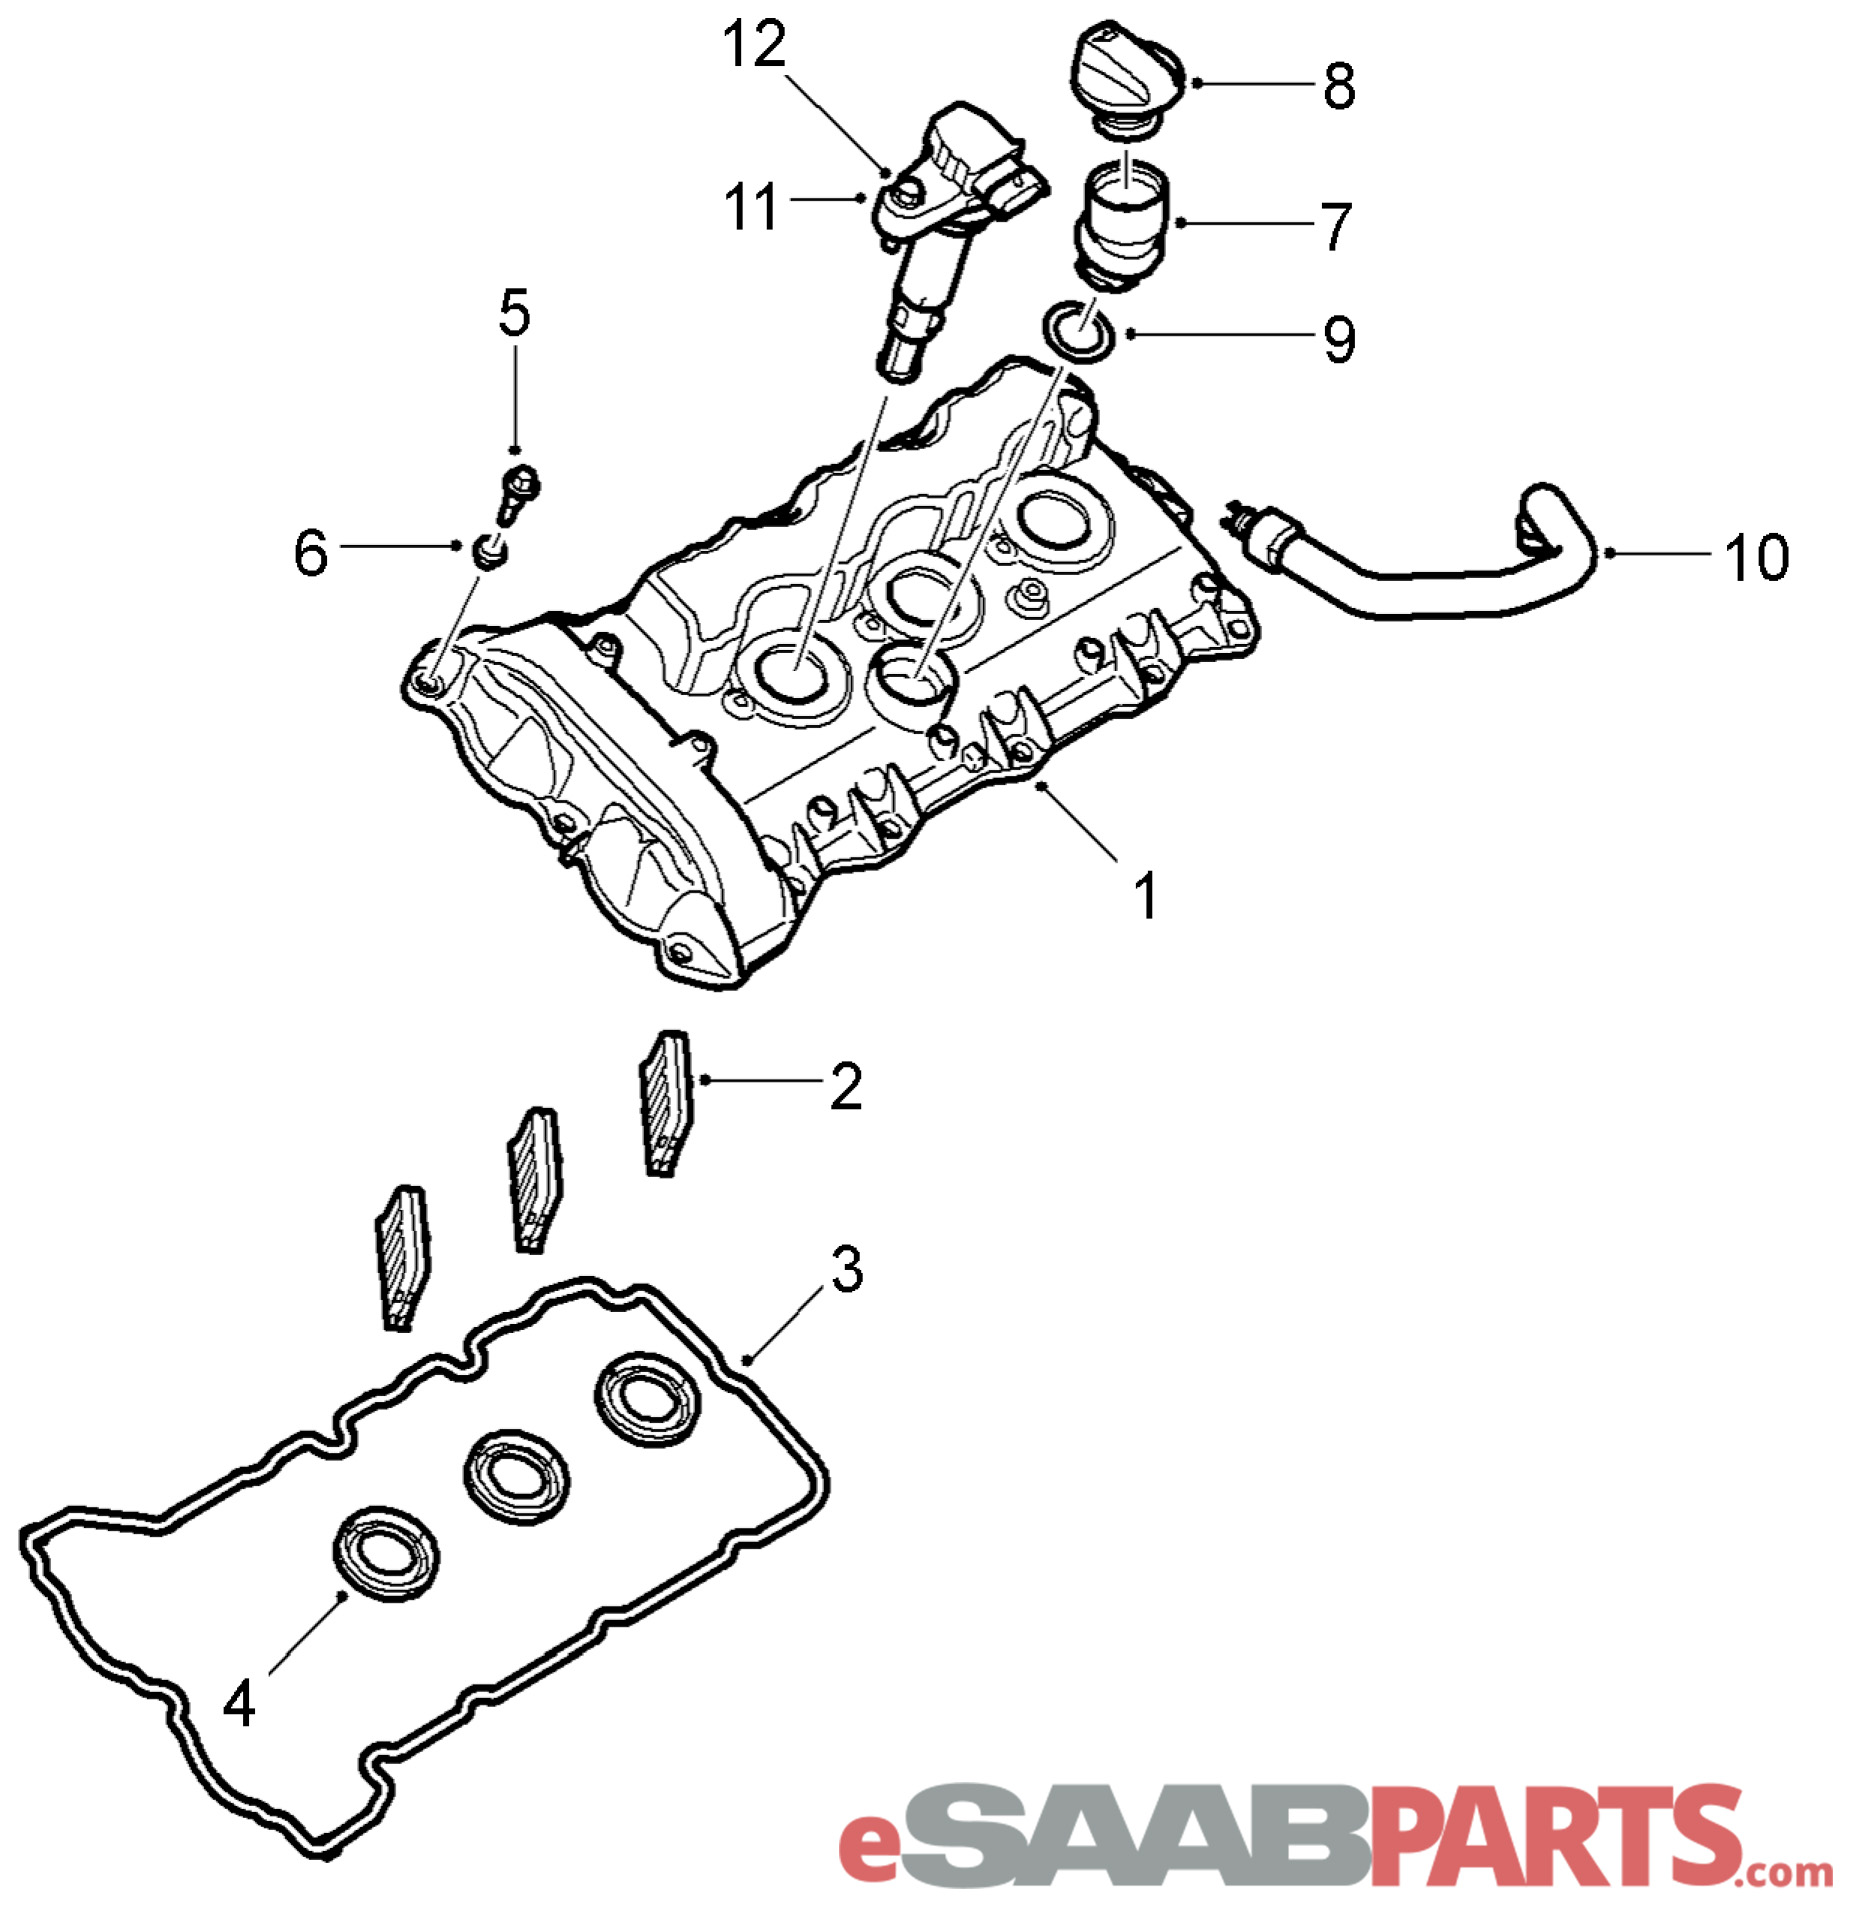 hight resolution of esaabparts com saab 9 3 9440 engine parts valve cover valve cover 2 8l b284